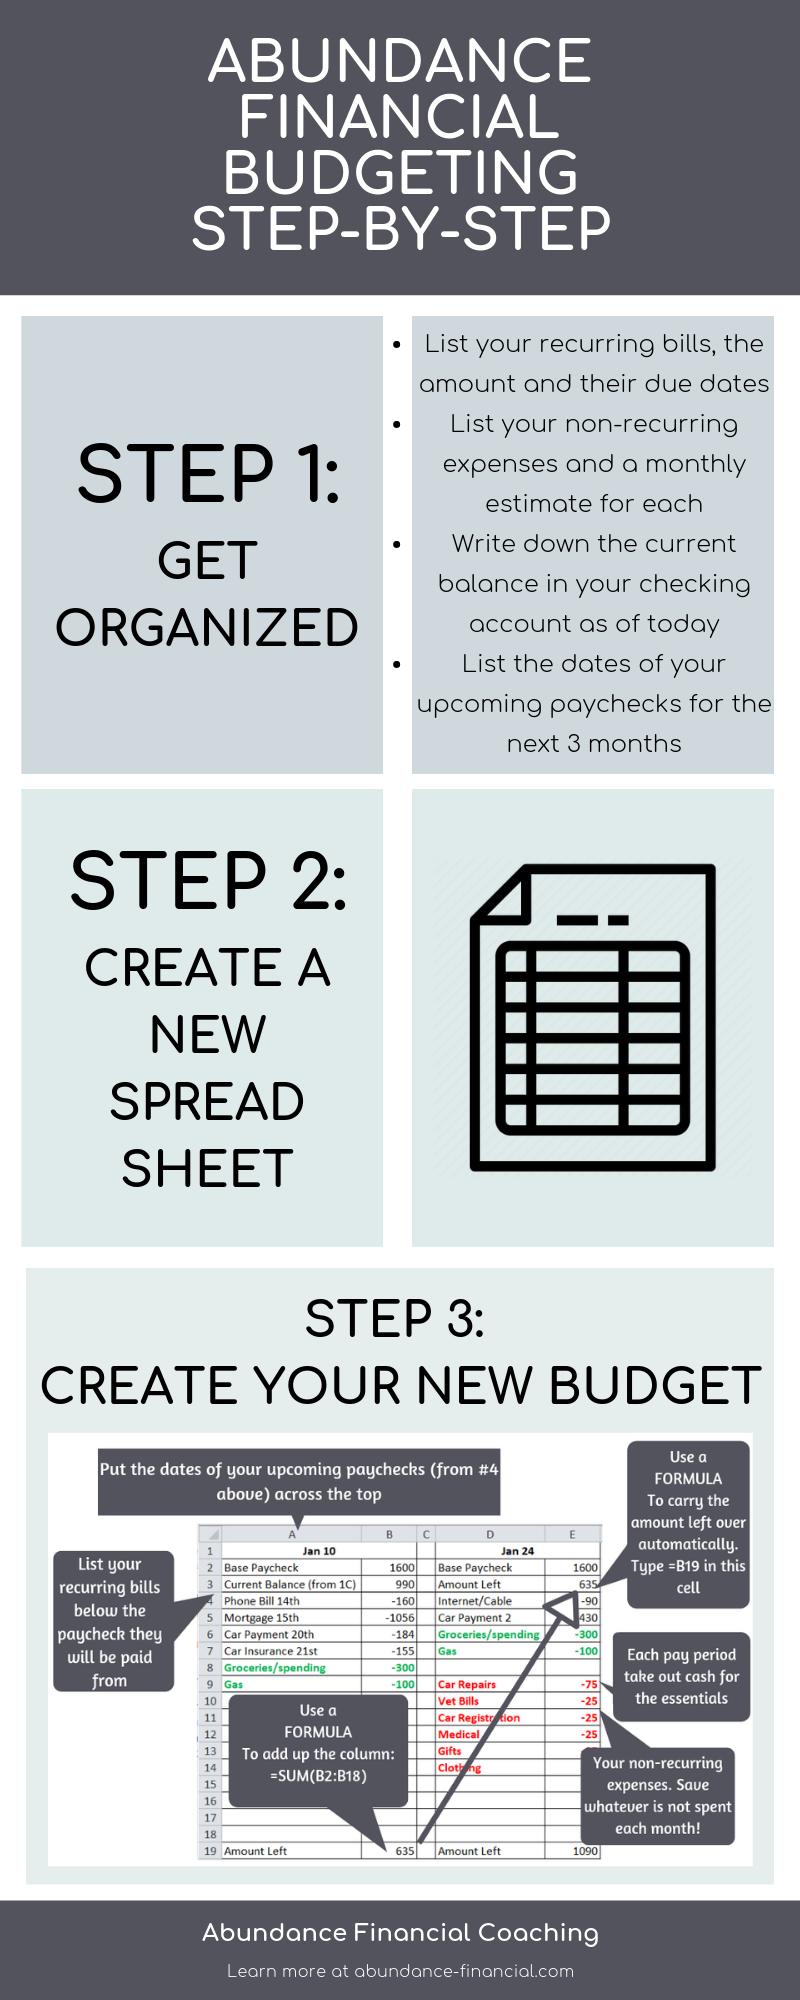 The Abundance Financial Budgeting Method